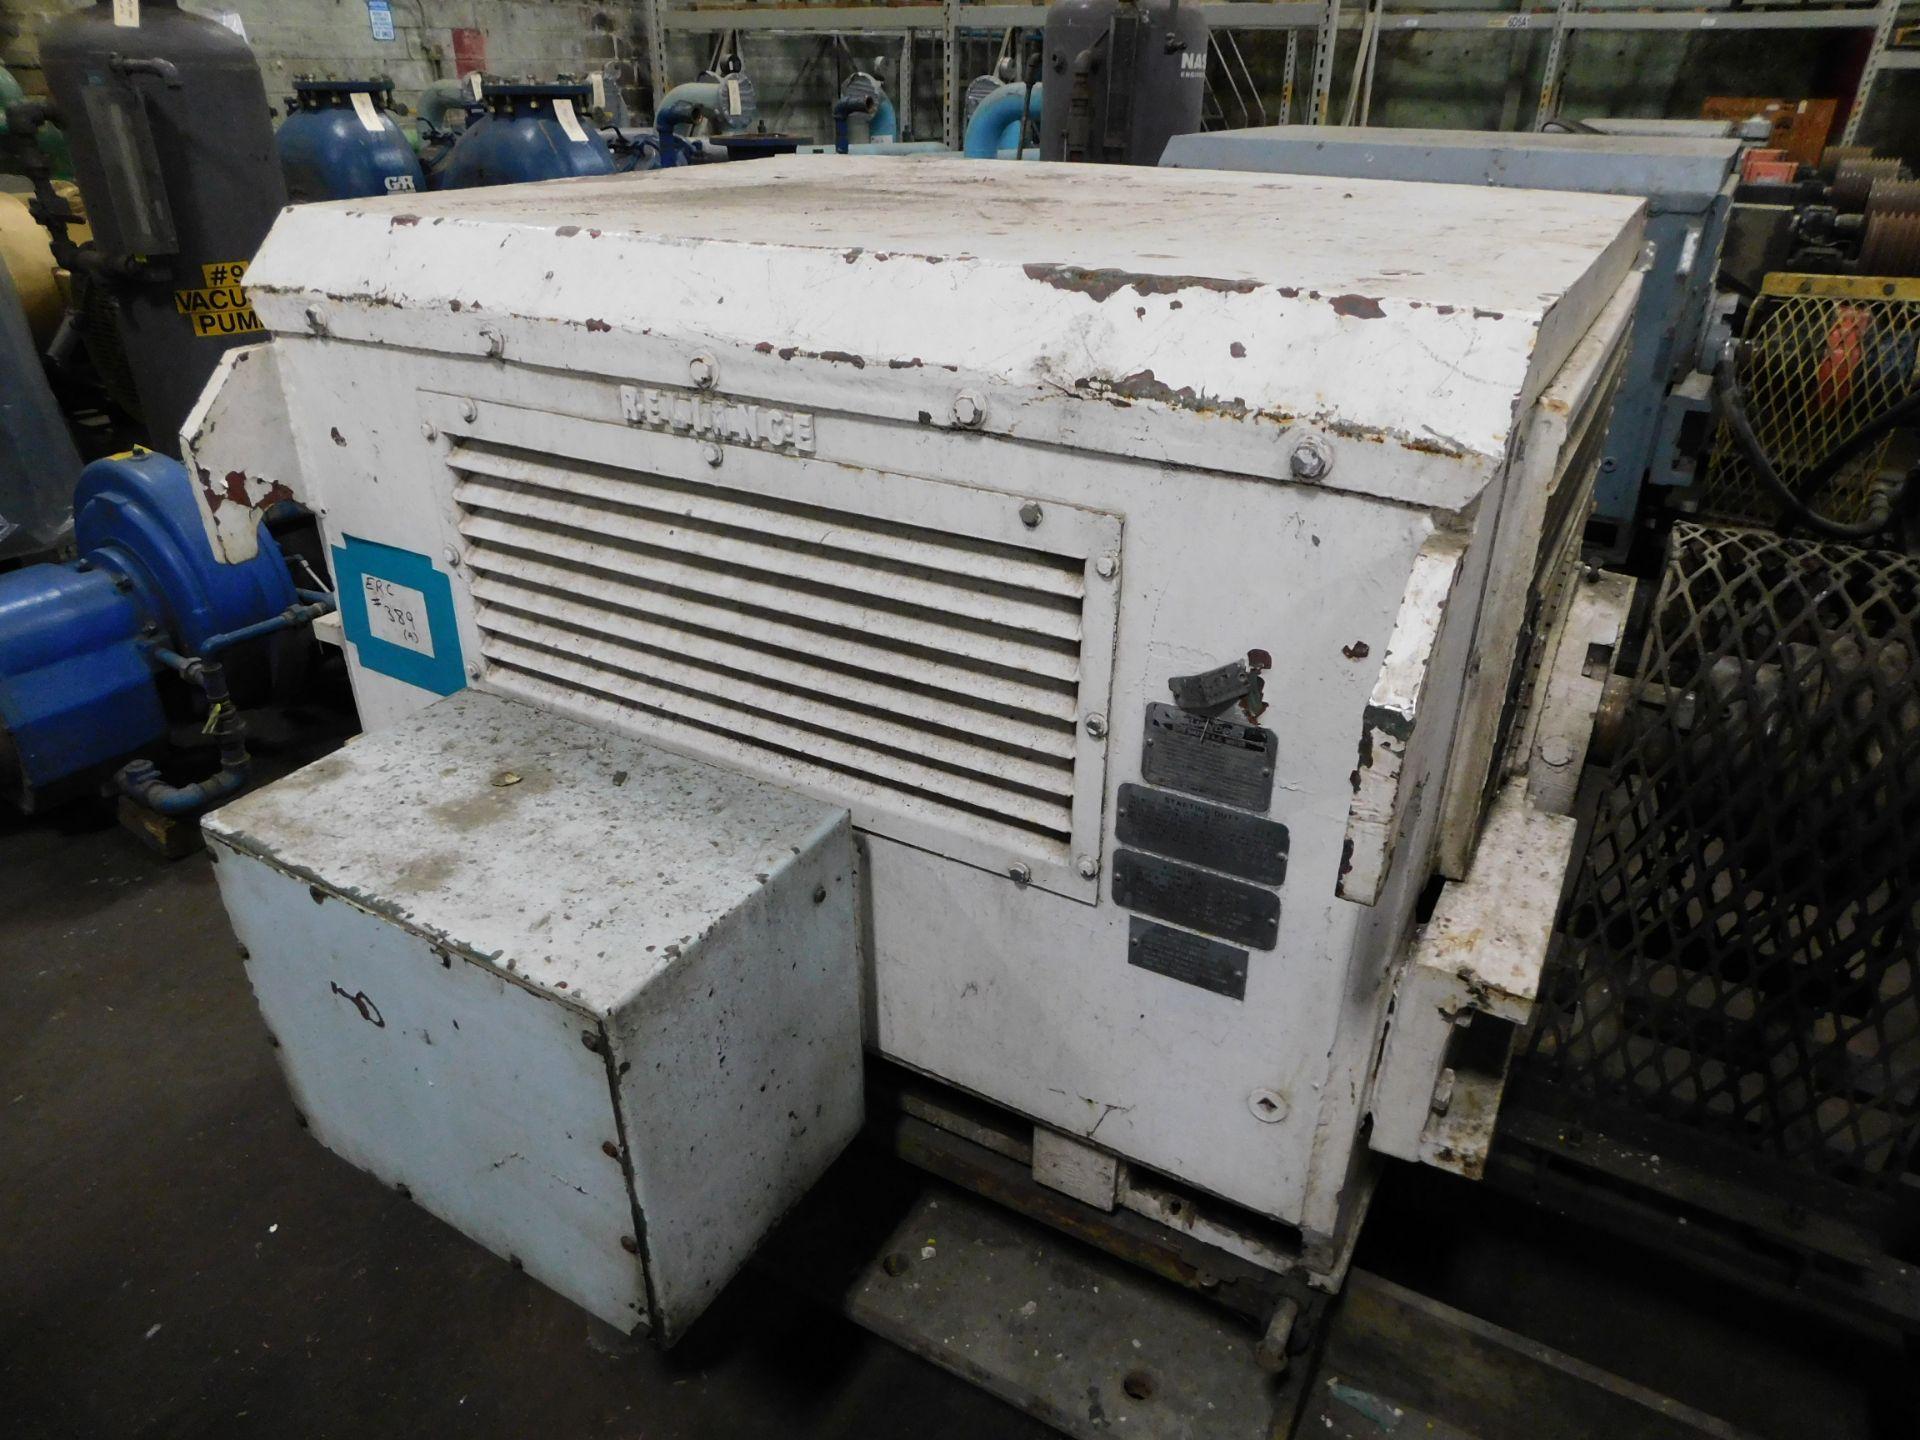 Reliance AC Duty Master Motor. 900 HP. 3 Ph. 60 Hz. 4160 V. 1789 RPM. 6809S. Type P. - Image 4 of 7